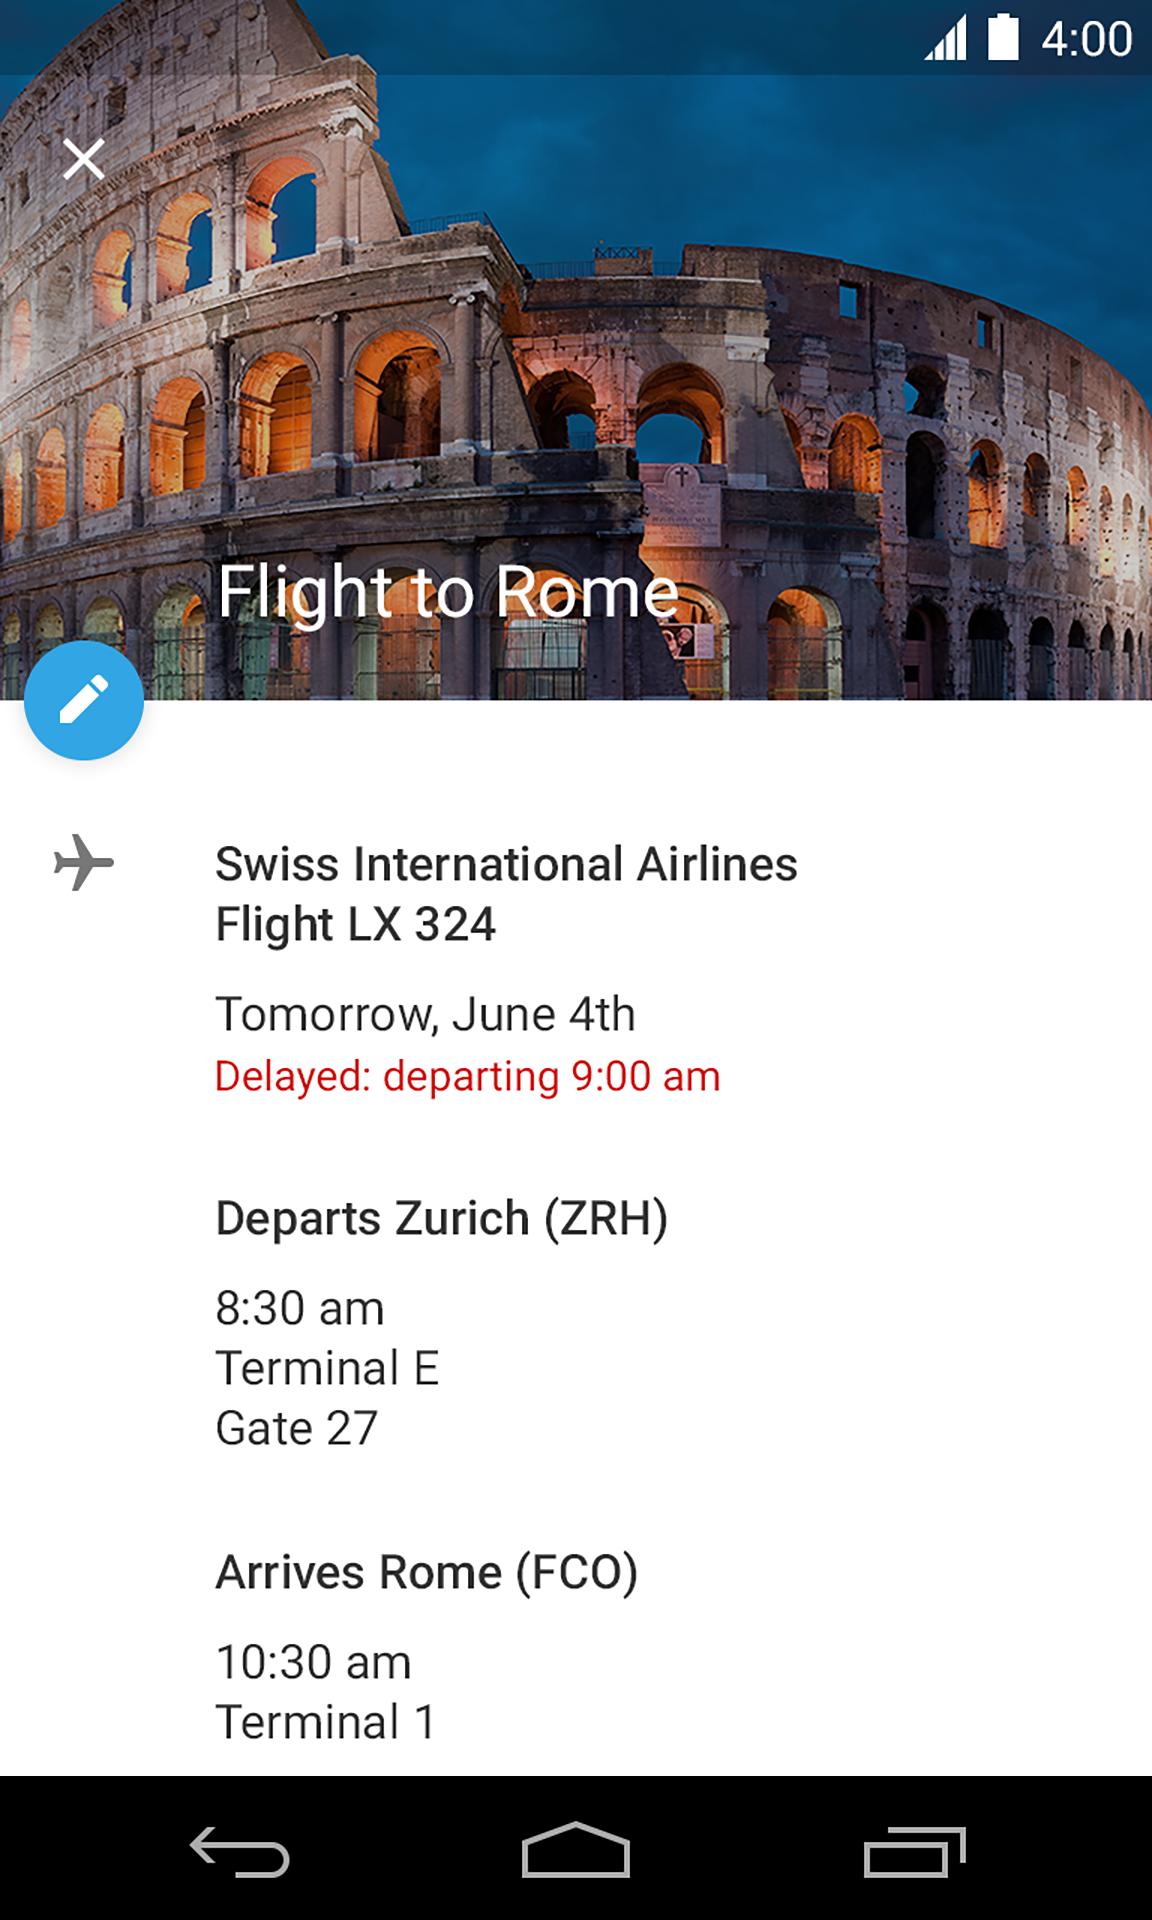 Flight Event in Google Calendar